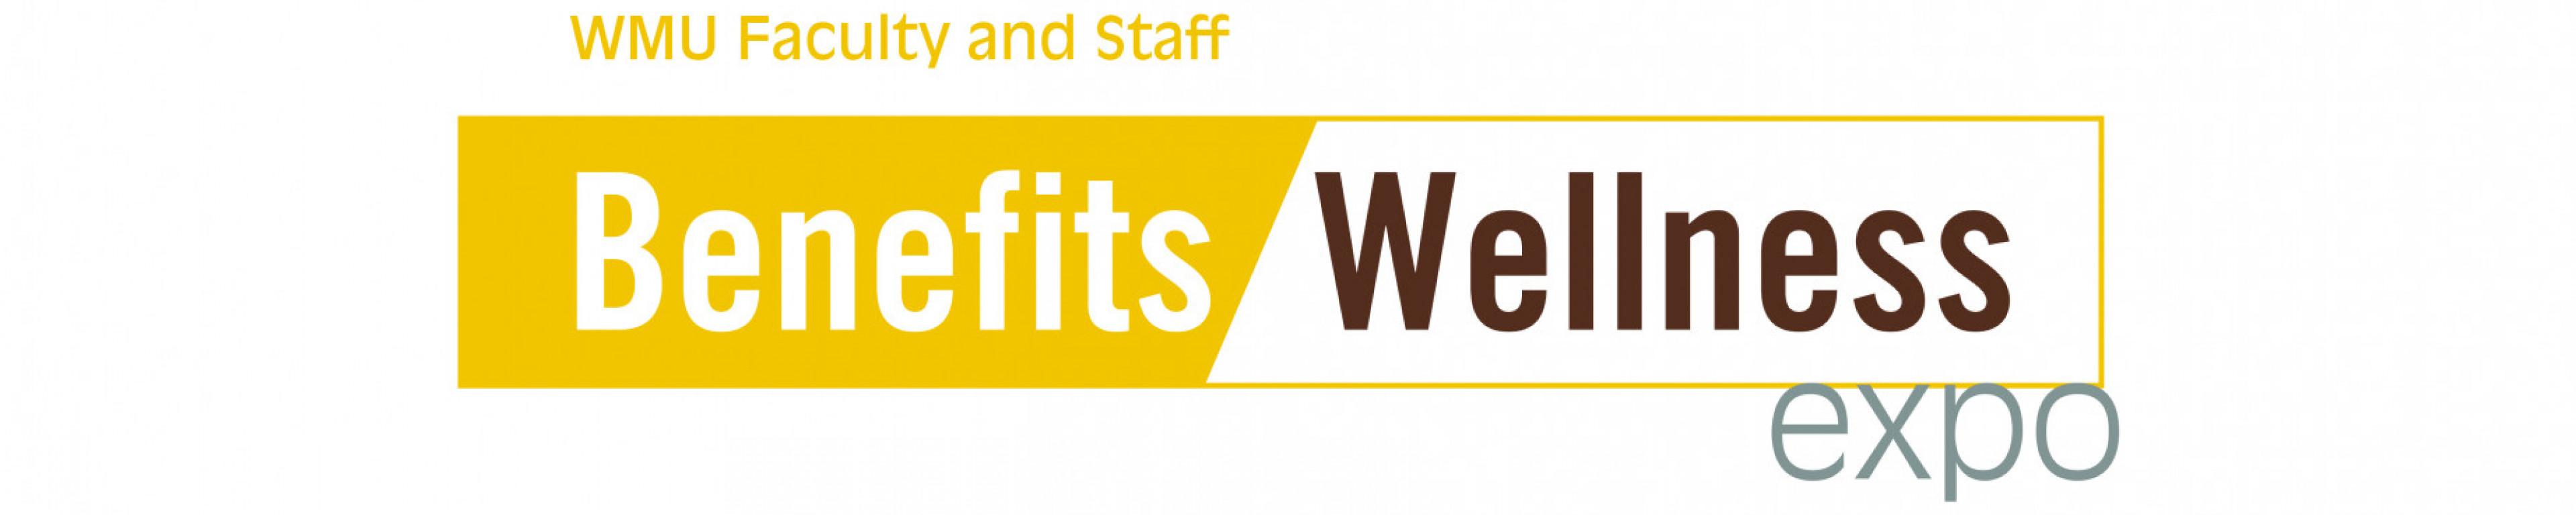 Benefits-Wellness Expo